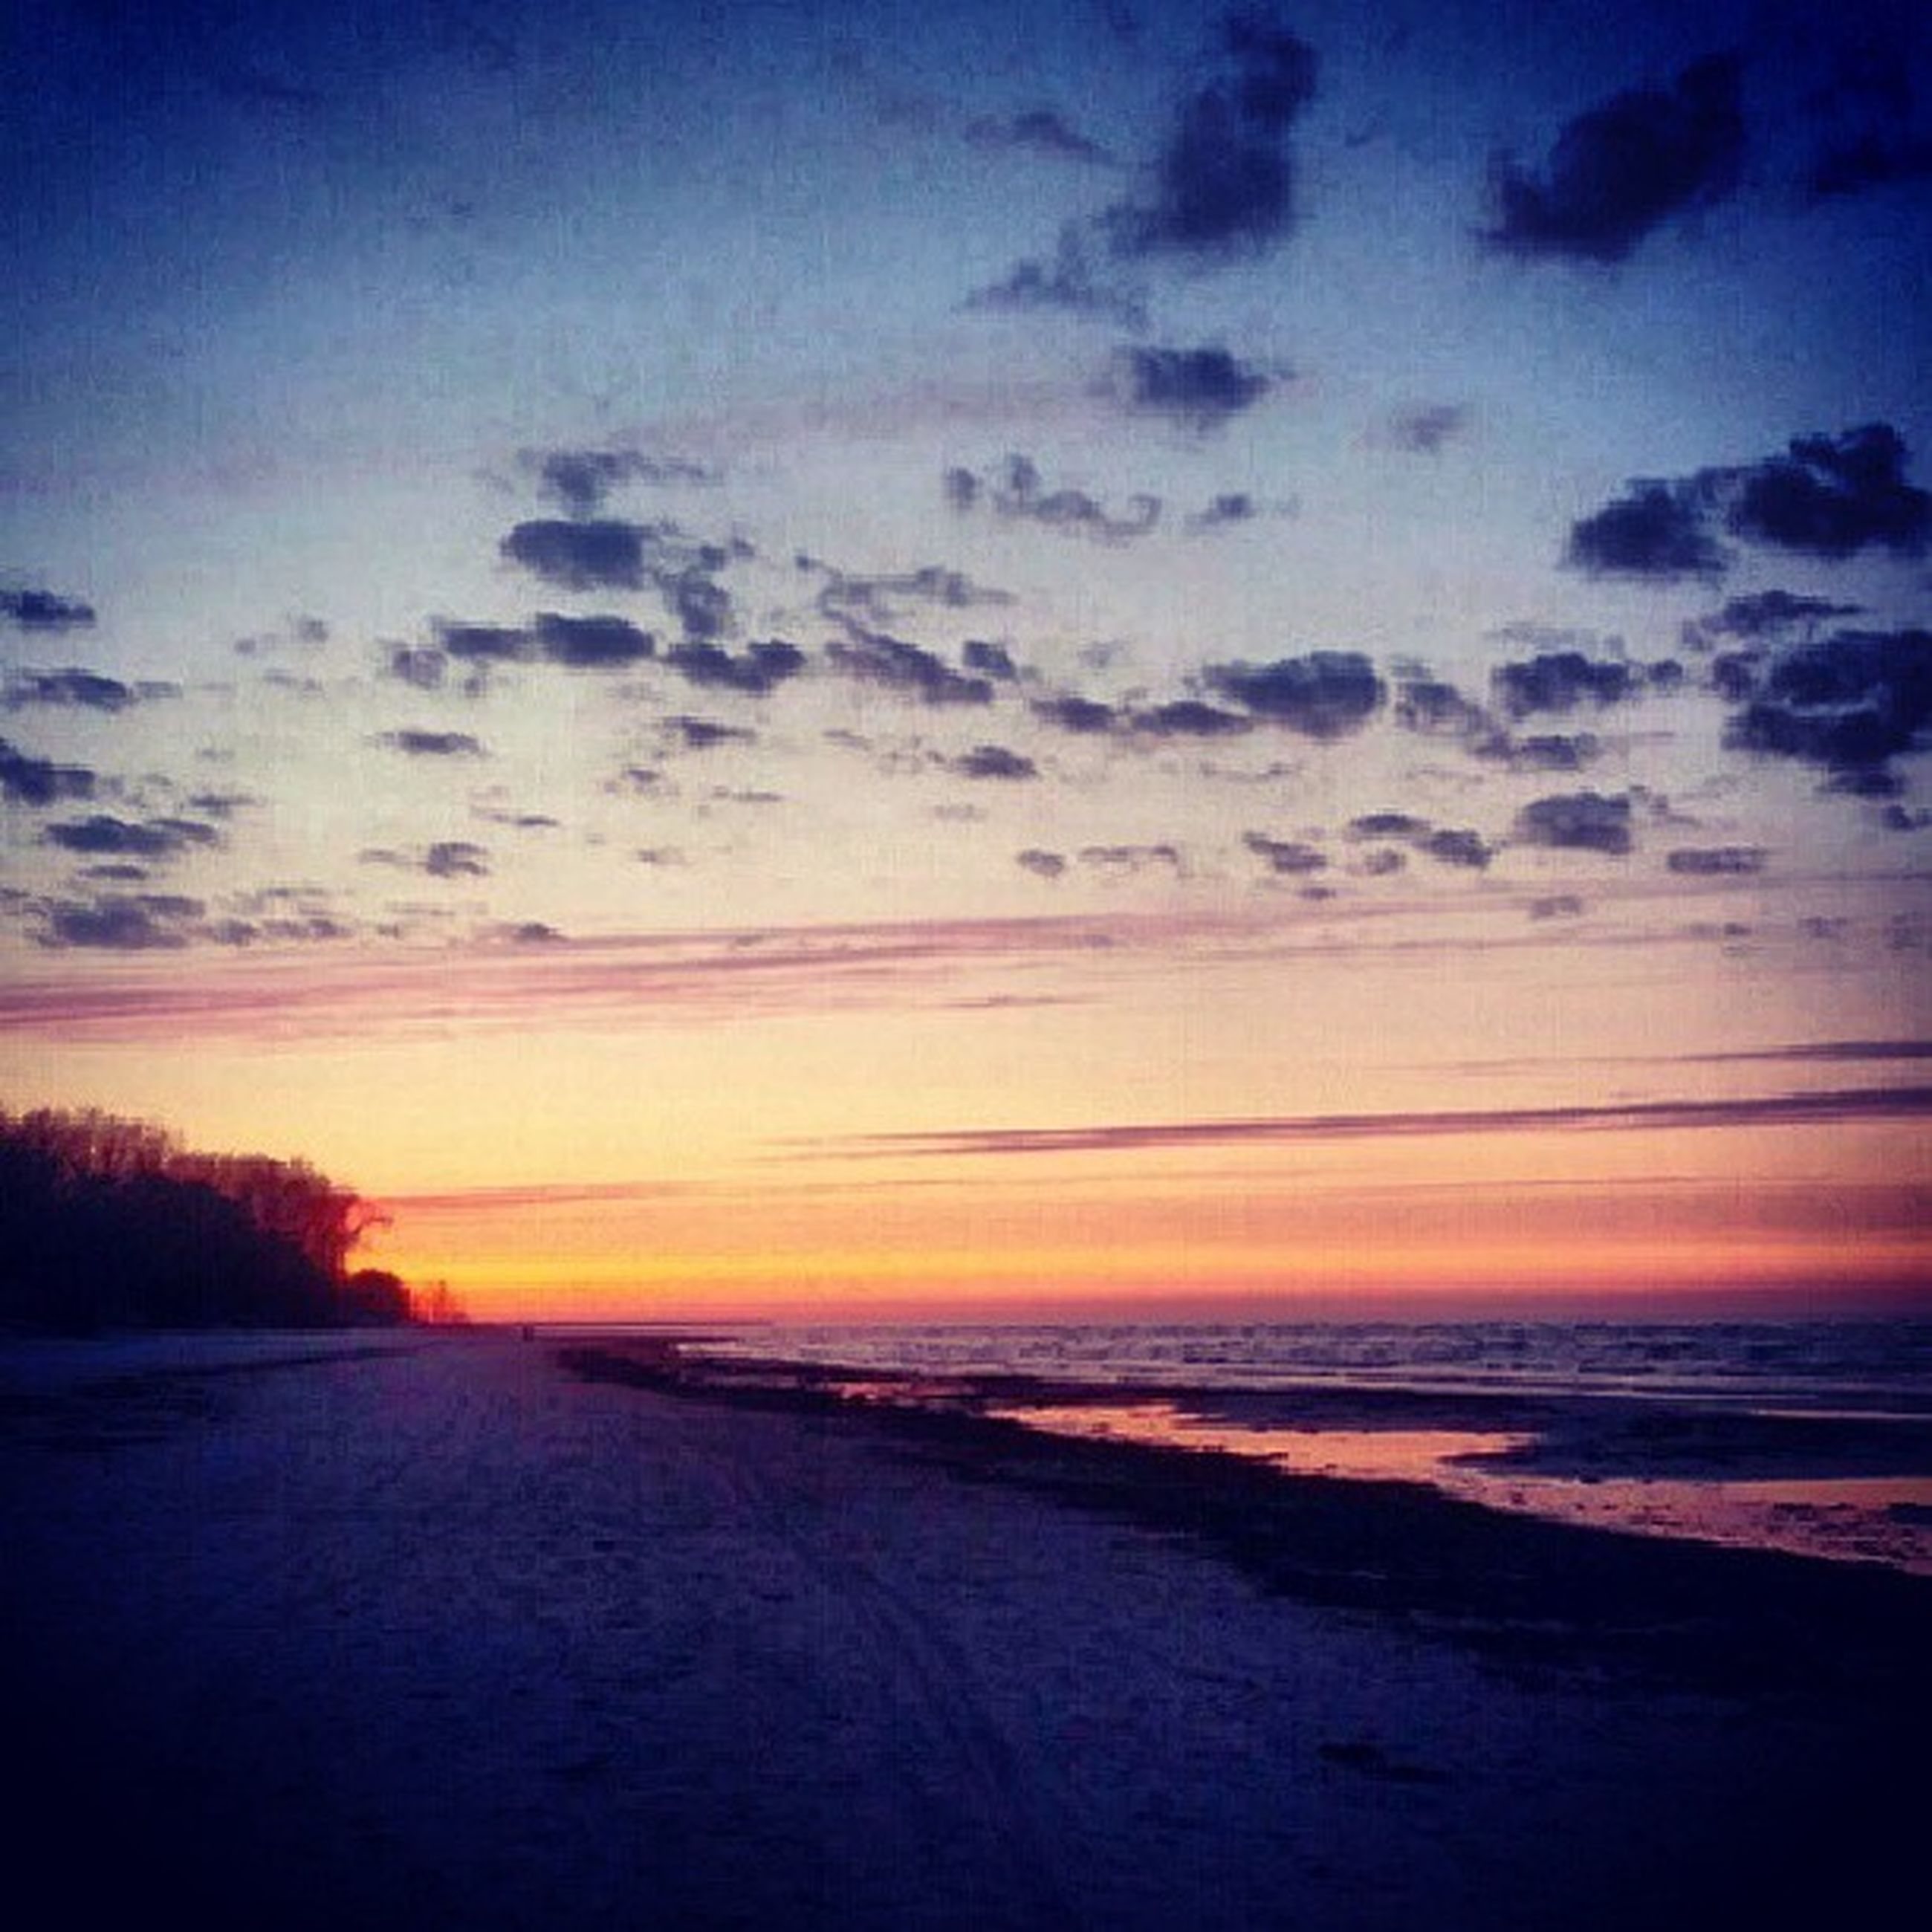 sunset, sea, beach, tranquil scene, sky, horizon over water, tranquility, scenics, water, beauty in nature, shore, sand, nature, idyllic, cloud - sky, orange color, cloud, dusk, non-urban scene, outdoors